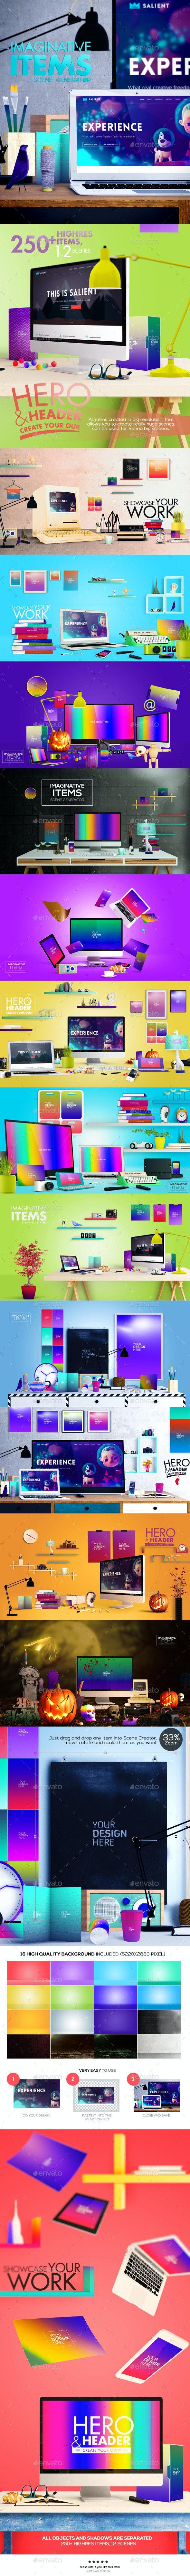 Imaginative Items Scene Generator - Hero Images Graphics